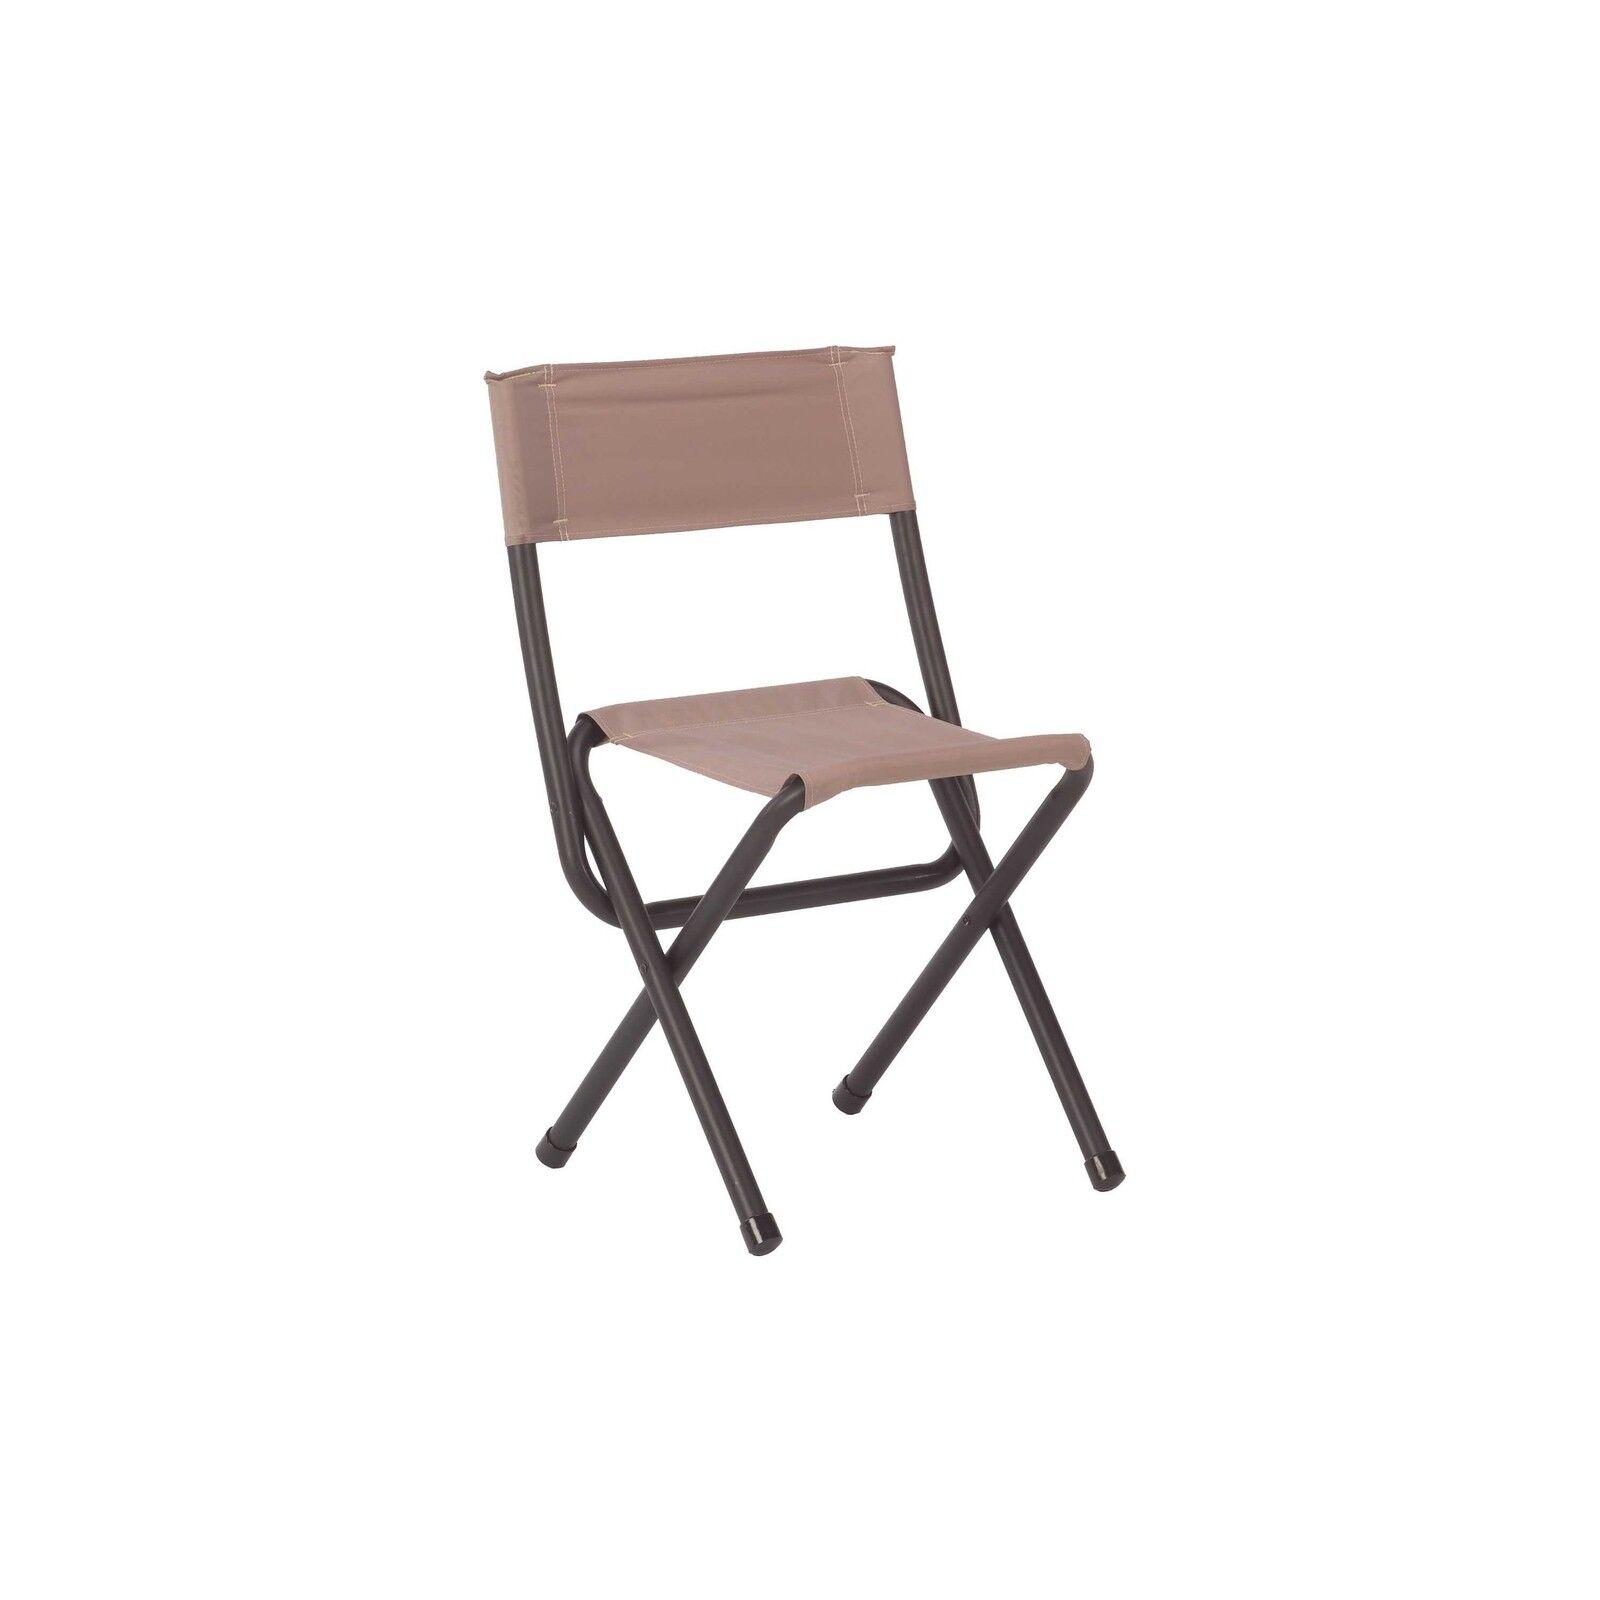 Chairs Coleman Woodsman II Chair